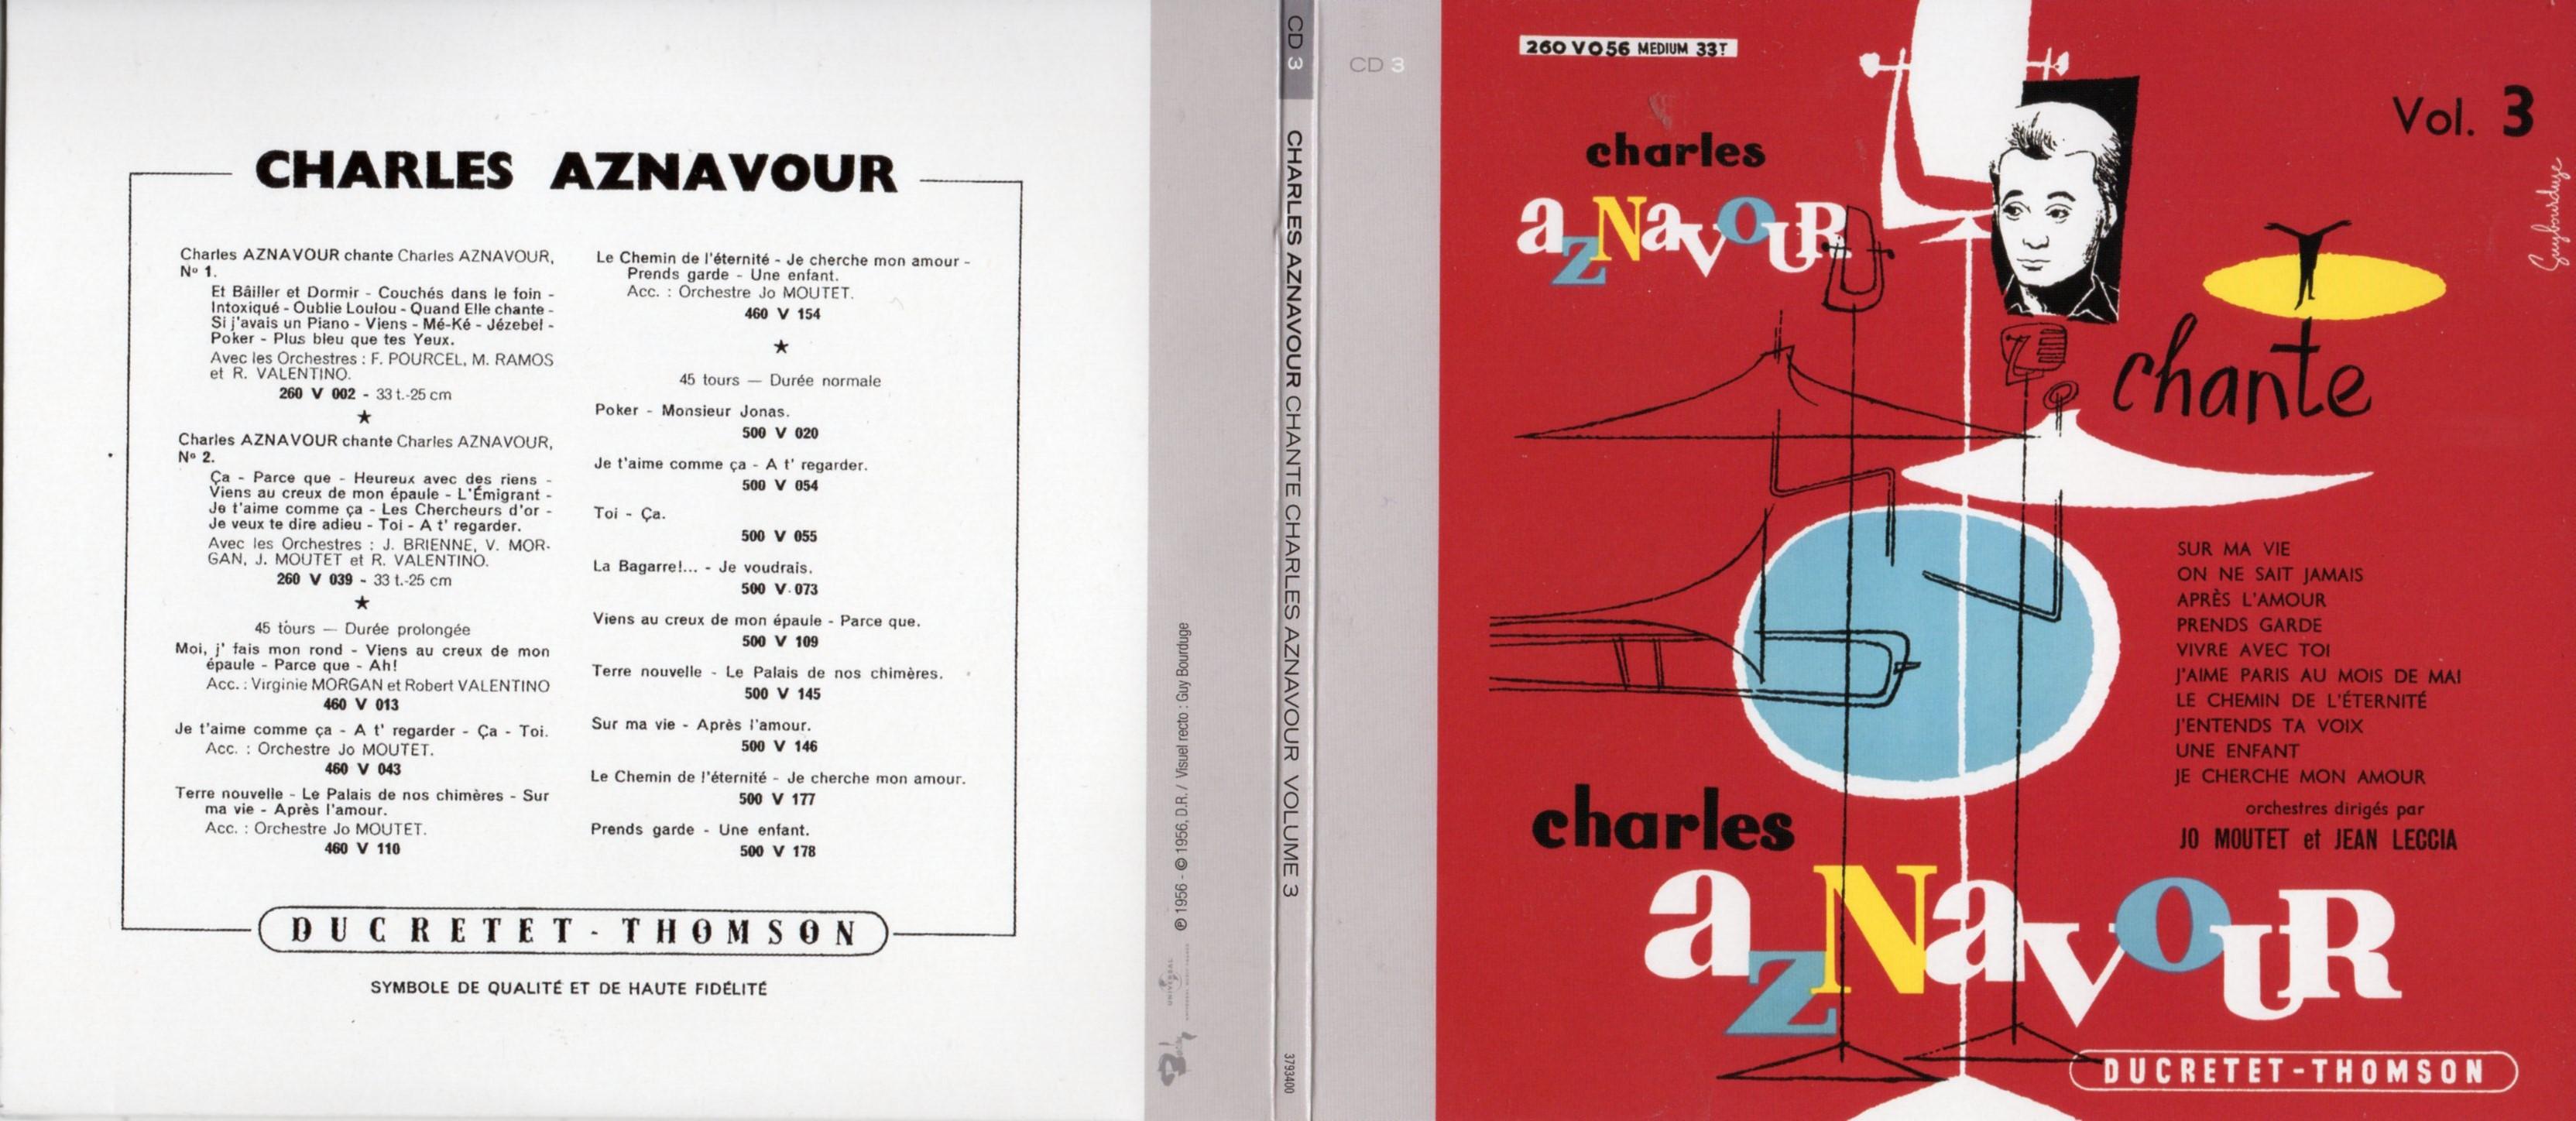 CHARLES AZNAVOUR - Charles Aznavour Chante vol 3 ... (1956) Gatefold Card board REPLICA sleeve - CD